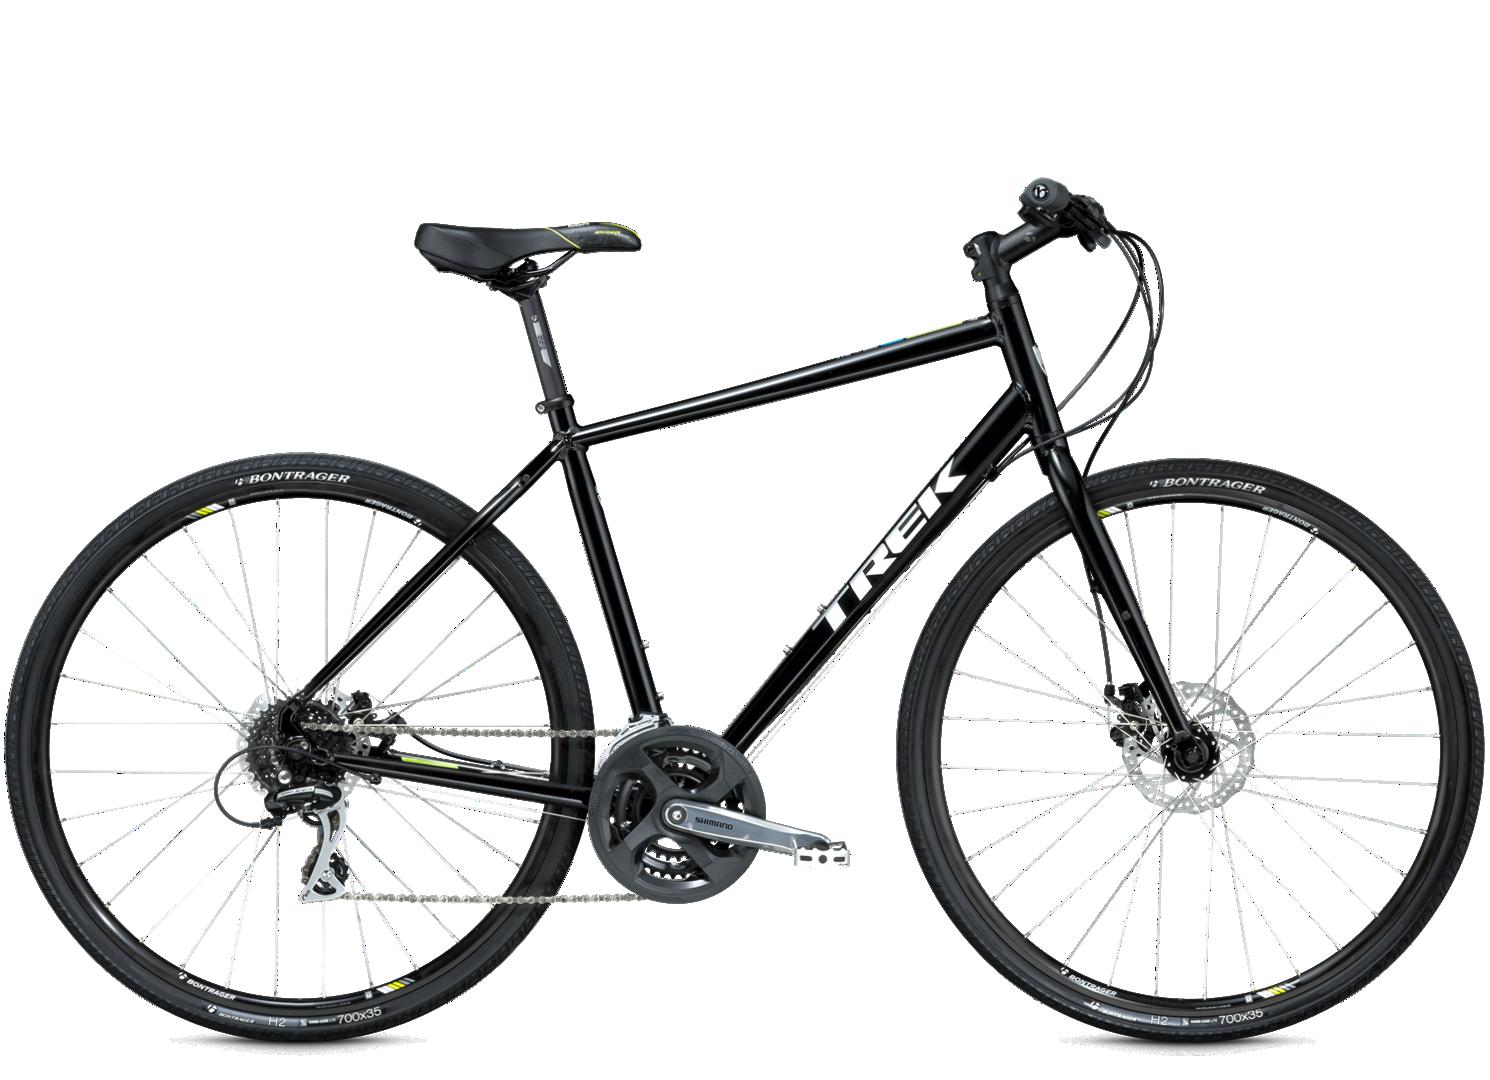 Trek 7 2 Fx Disc With Images Trek Bicycle Bicycle